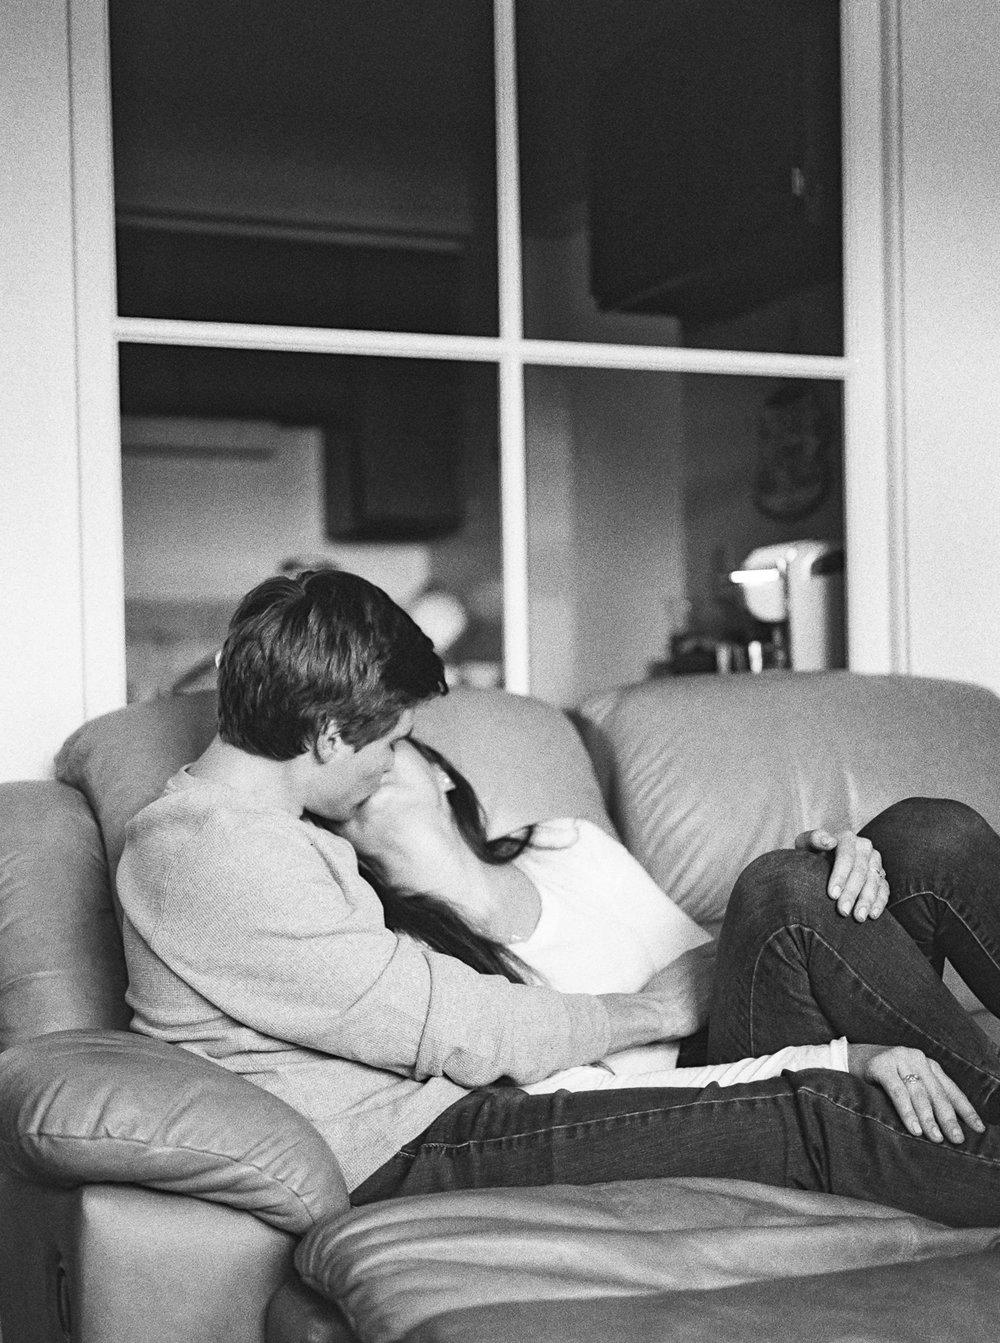 Intimate Engagement Photos At Home by Cleveland Wedding Photographer Matt Erickson Photography